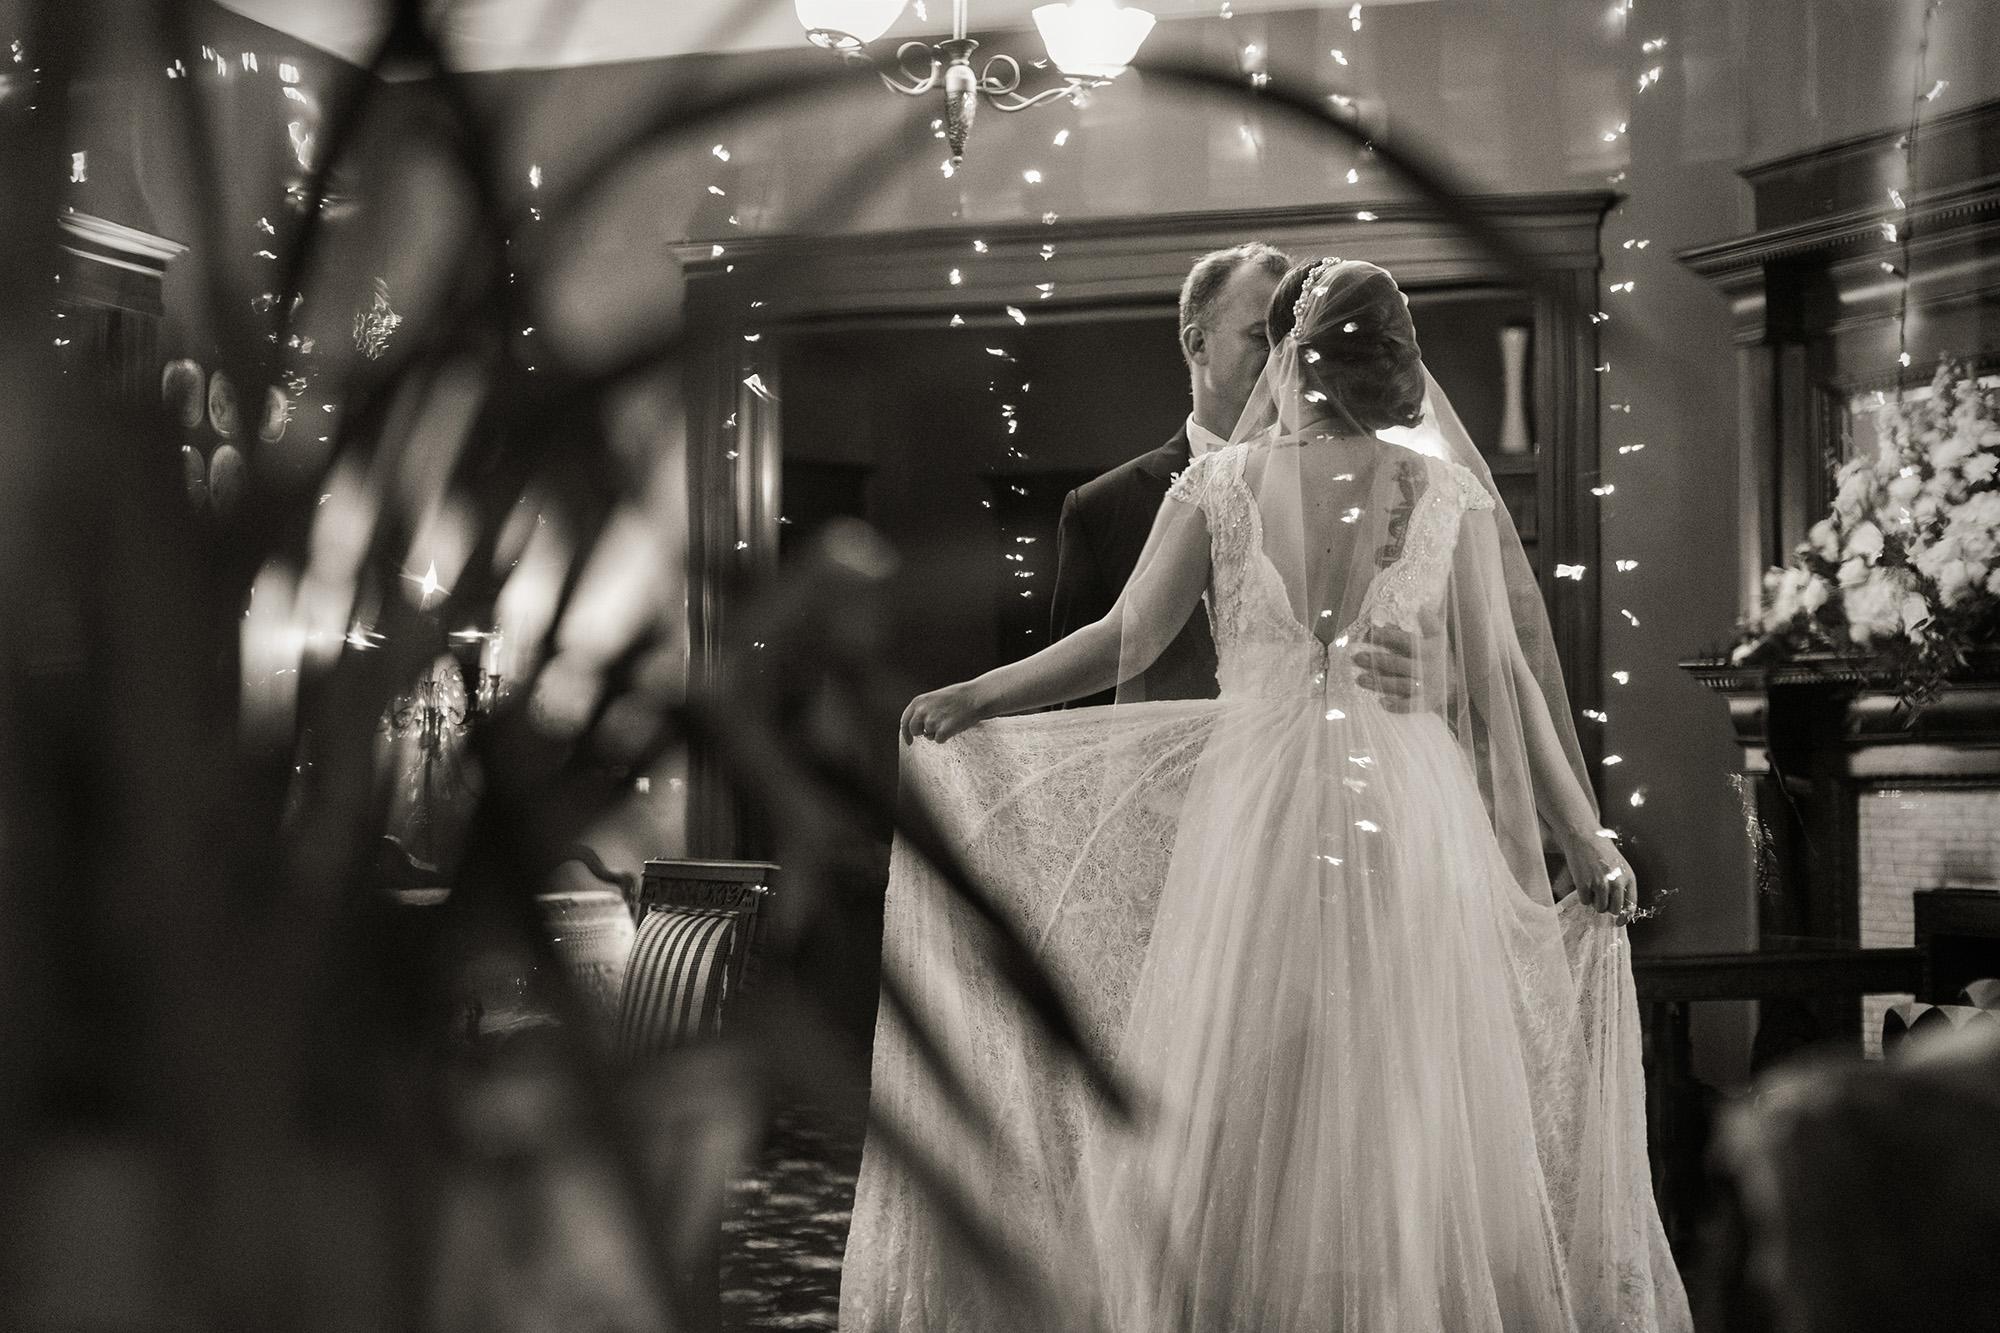 vintage-inspired-christmas-house-wedding-carrie-vines-119.jpg